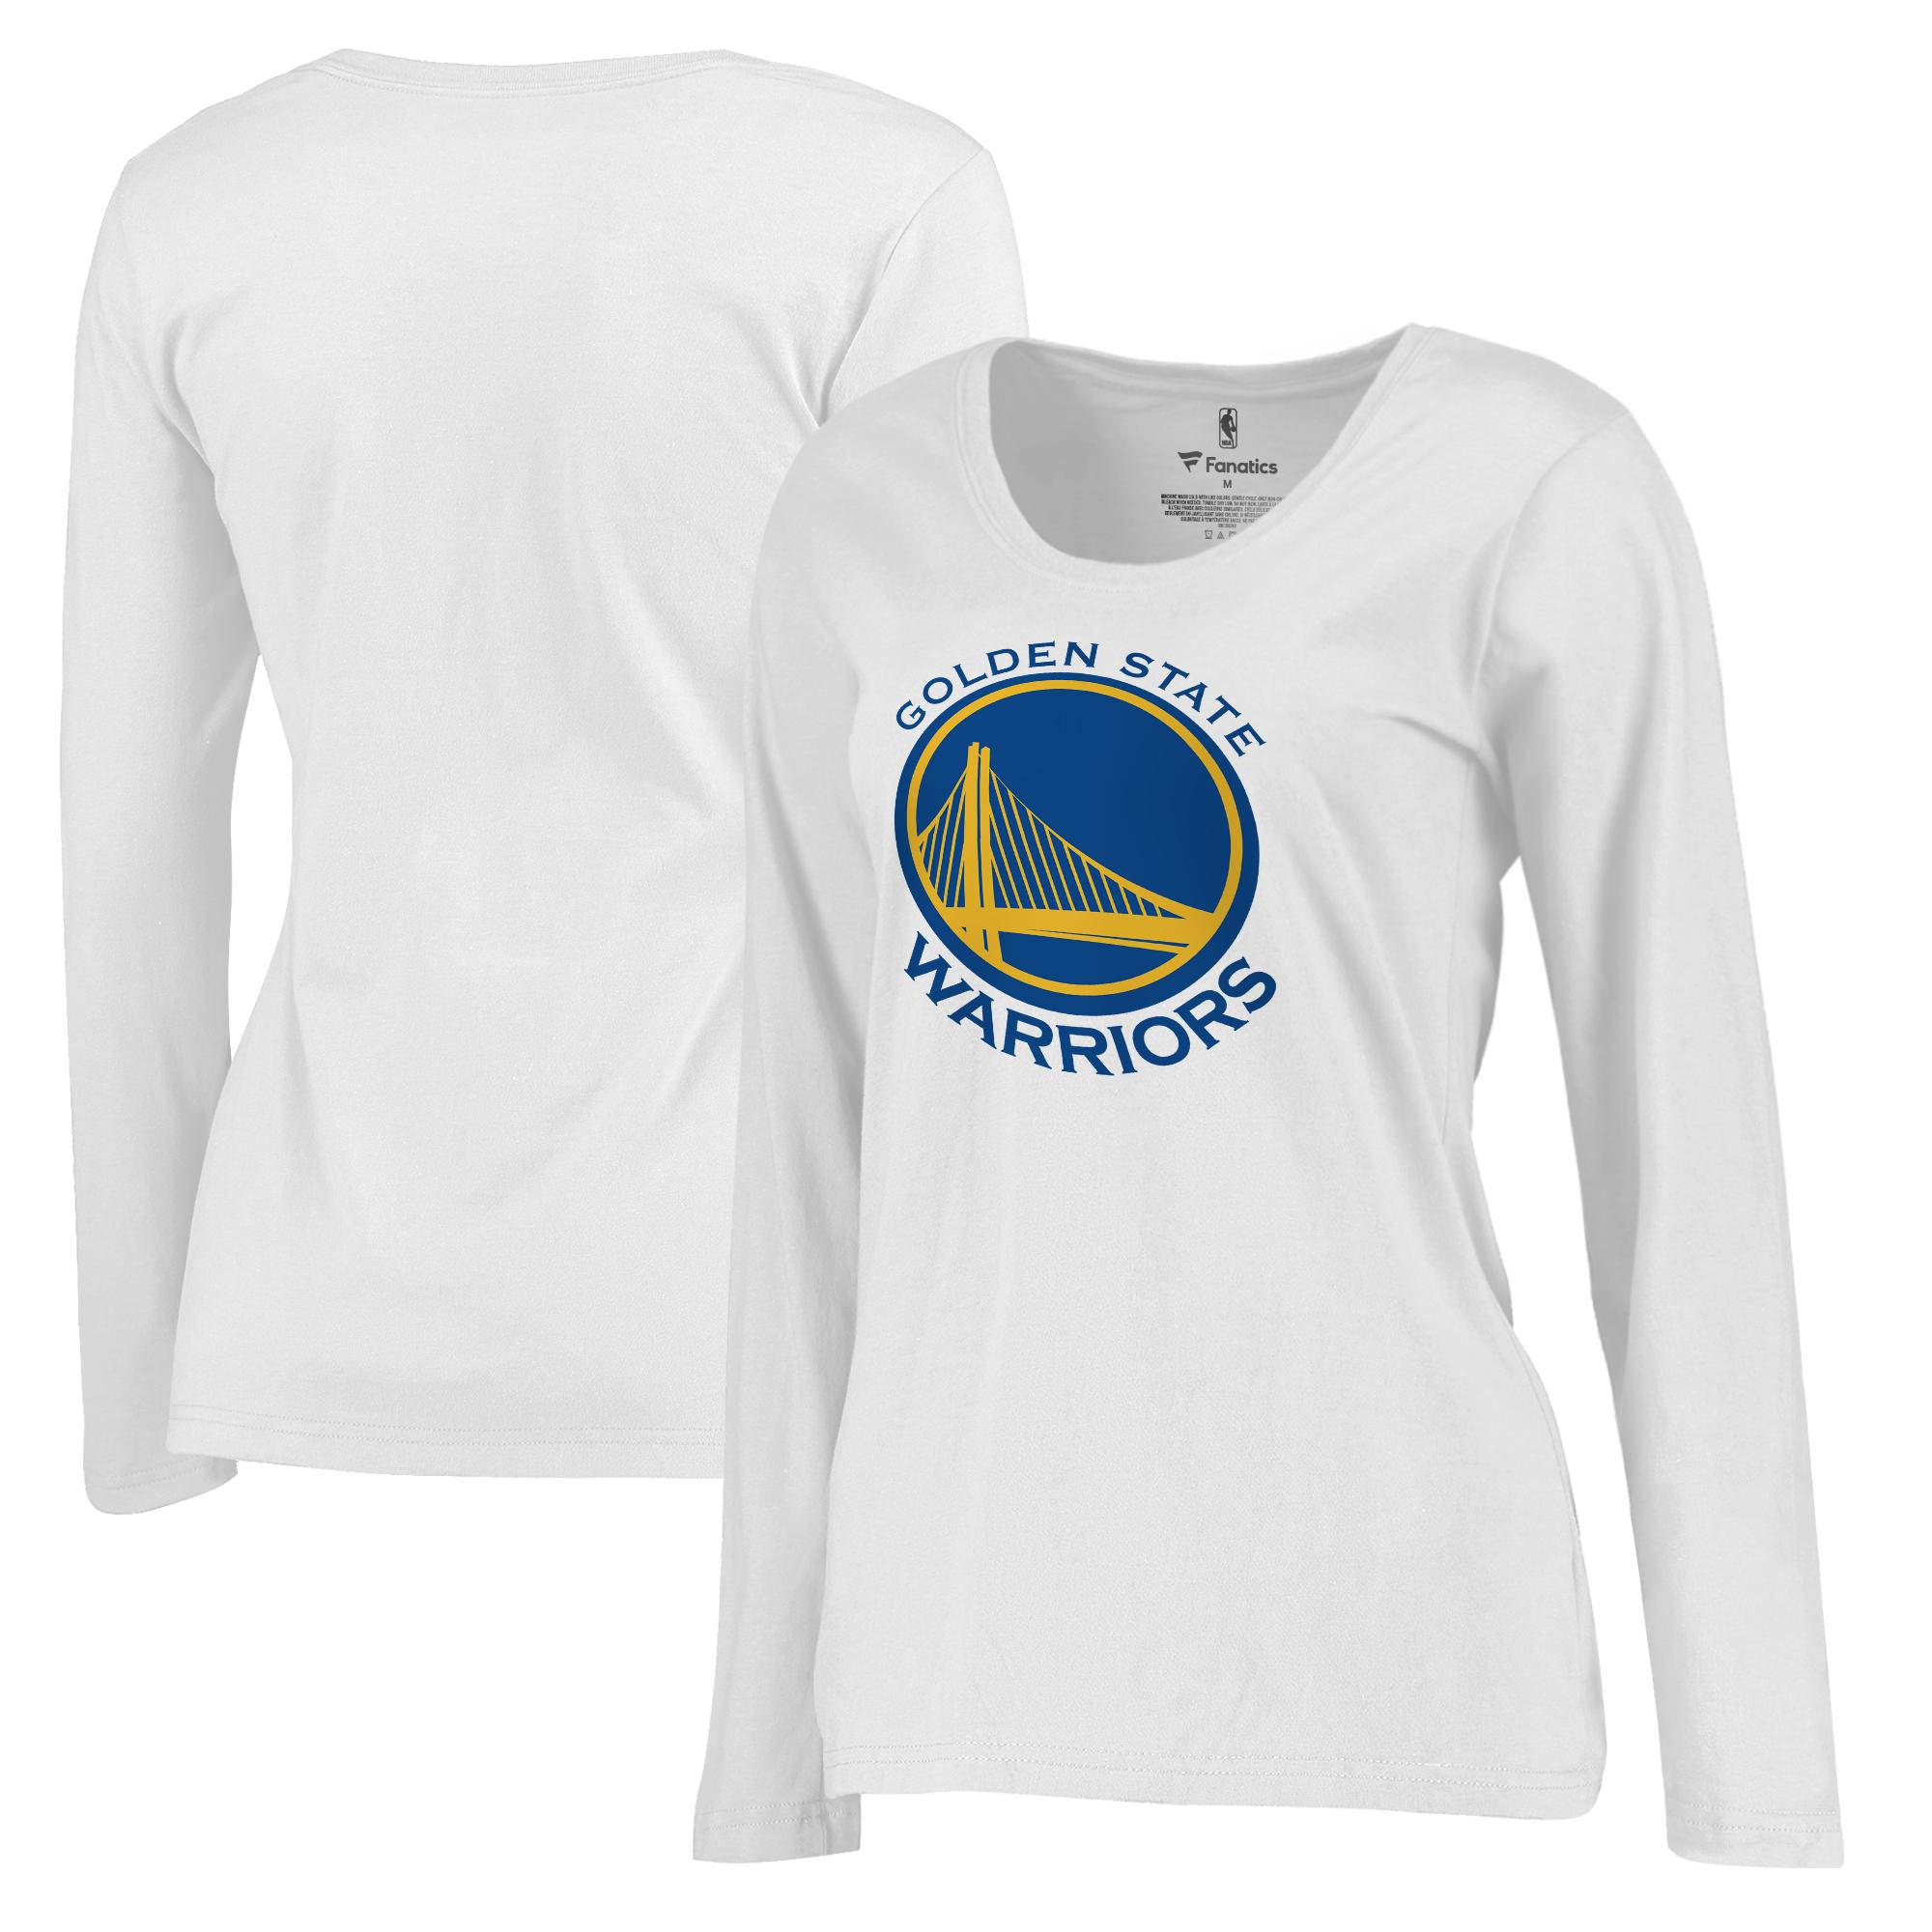 Golden State Warriors Fanatics Branded Women's Plus Sizes Team Primary Logo Long Sleeve T-Shirt - White